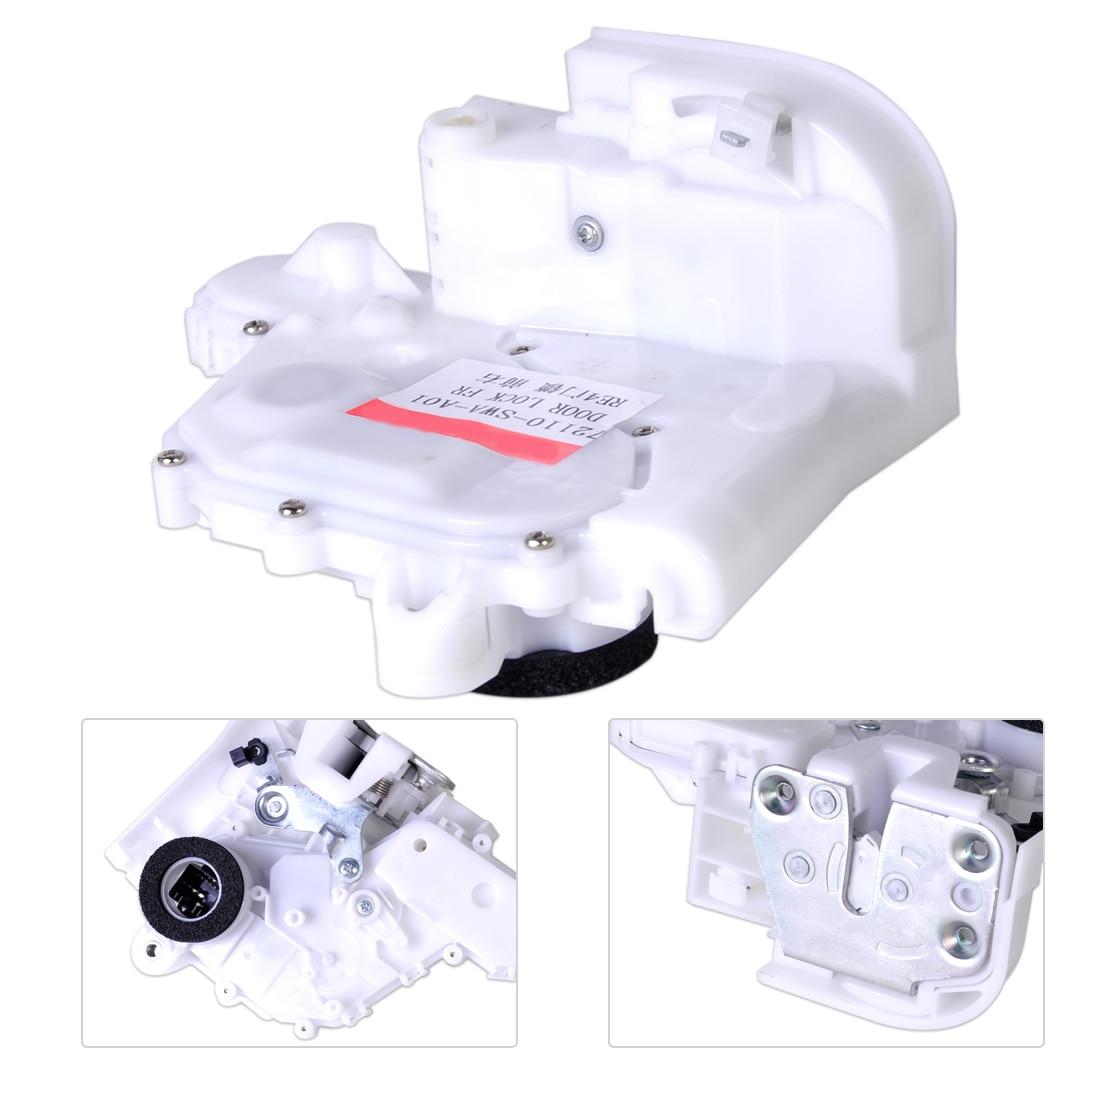 DWCX New Front Right Passenger Door Lock Latch Actuator 72110-SWA-D01 72110SWAD01 Fit For Honda CR-V 2007 2008 2009 2010 2011